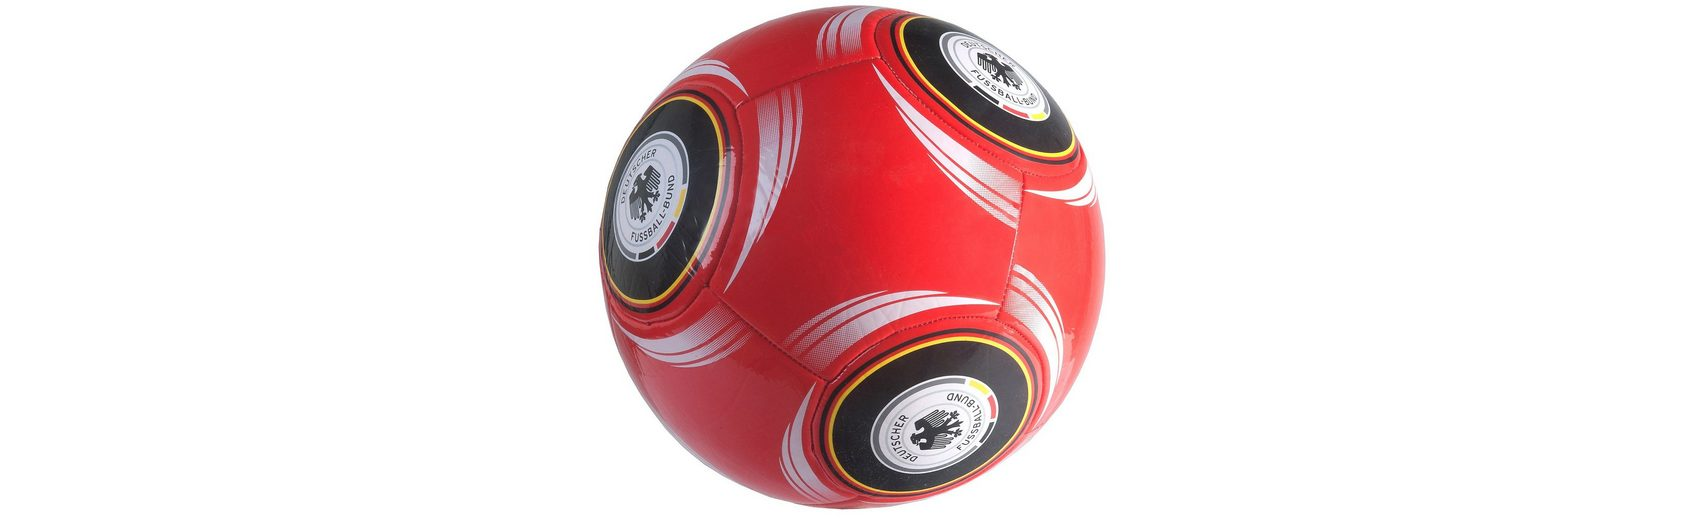 4UNIQ DFB Fußball Gr. 5, rot